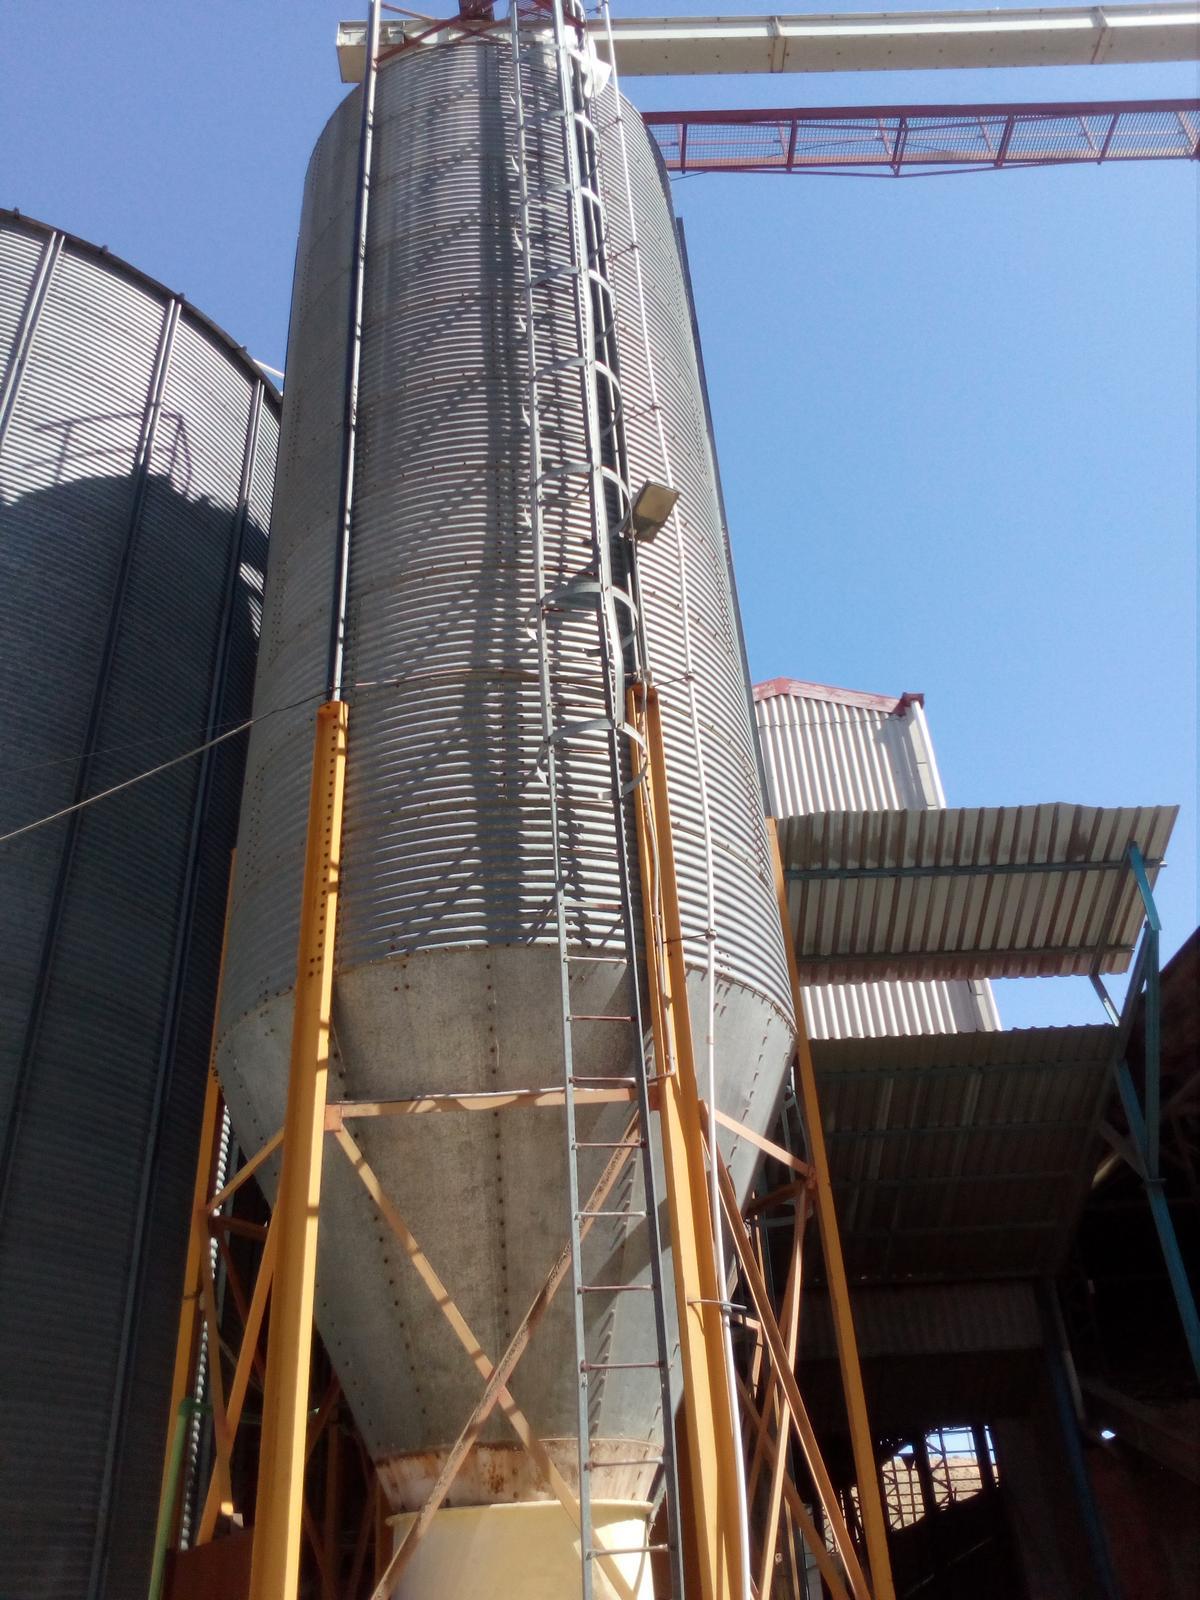 fabrica piensos ecologicos gapiba 04